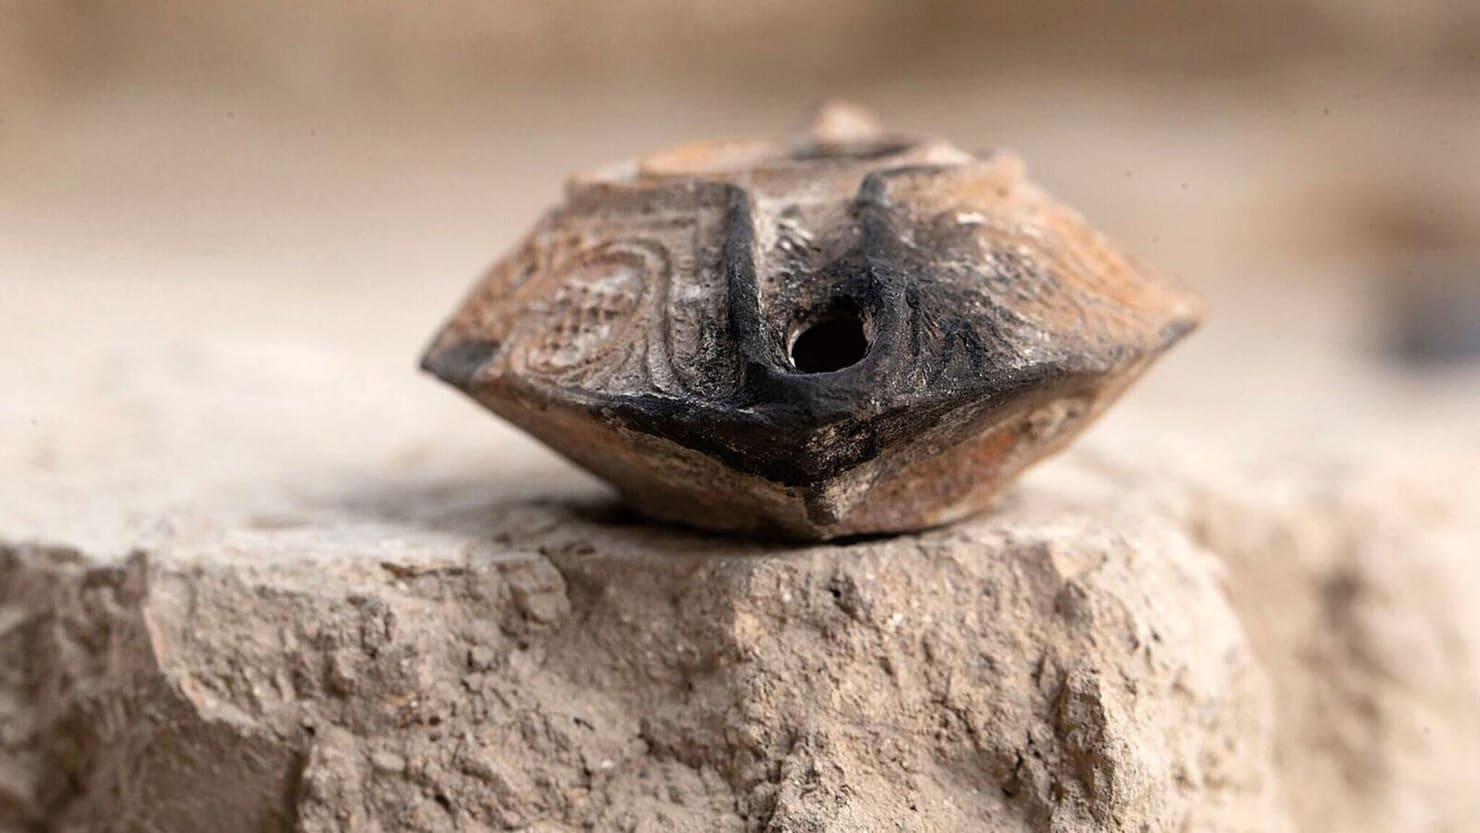 The Muslim Evil-Eye Amulet Discovered in a Jerusalem Parking Lot